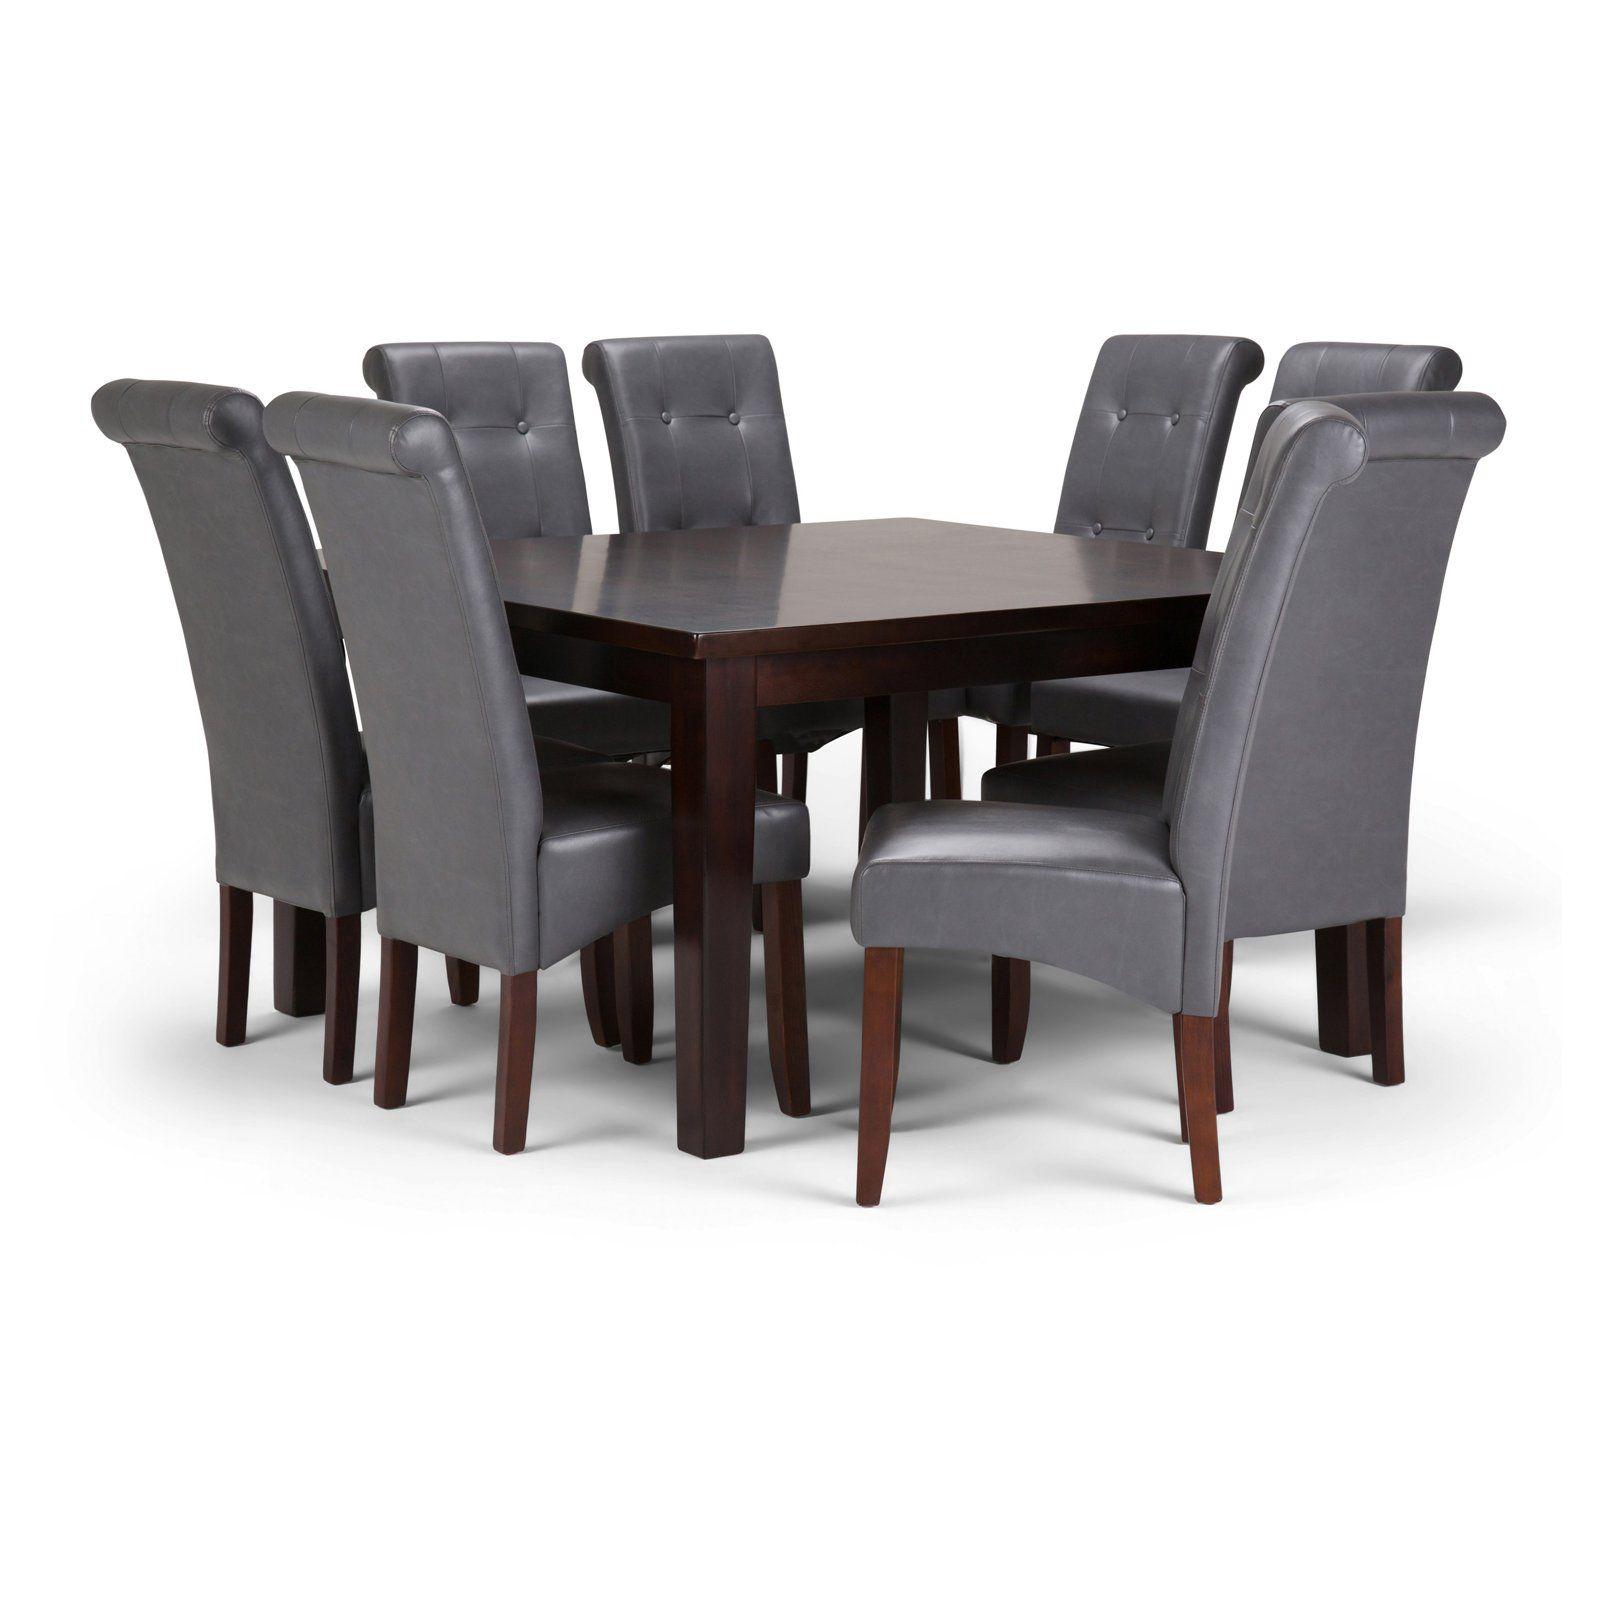 Simpli Home Cosmopolitan 9 Piece Dining Table Set In 2019 Dining